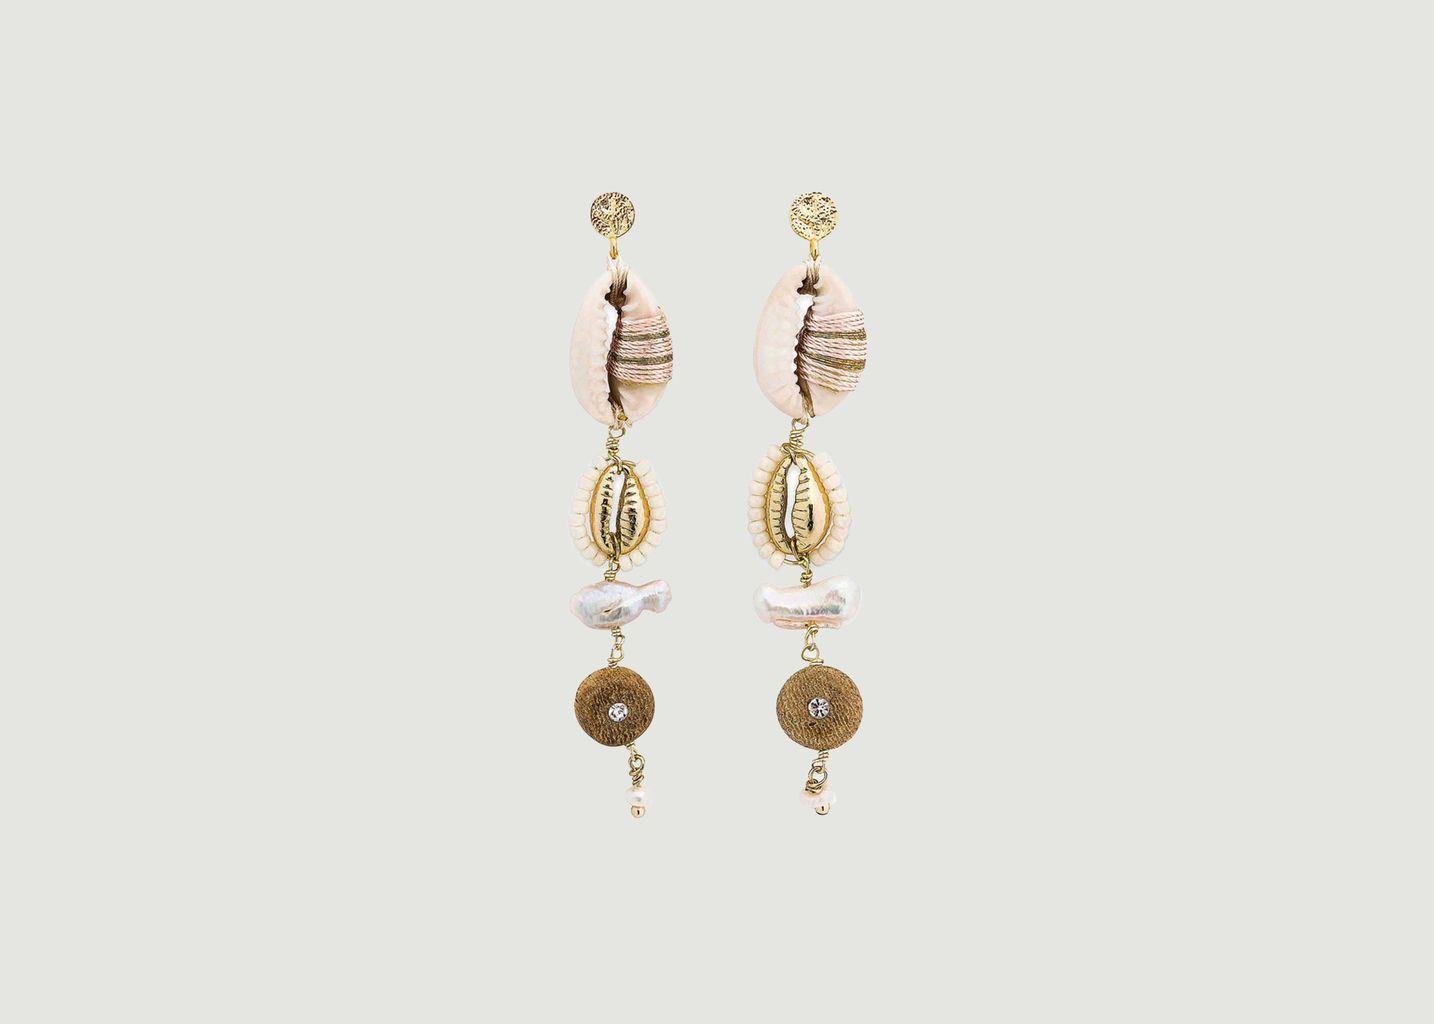 Boucles d'oreilles Borneo - Hipanema